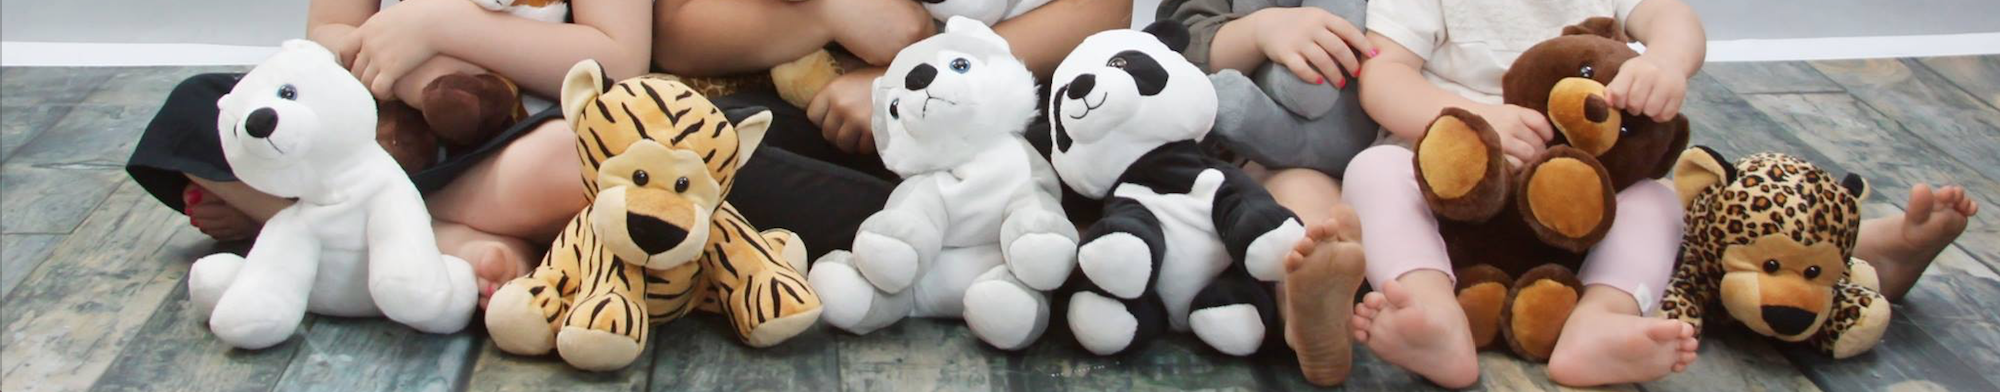 microwavable plush cuddles